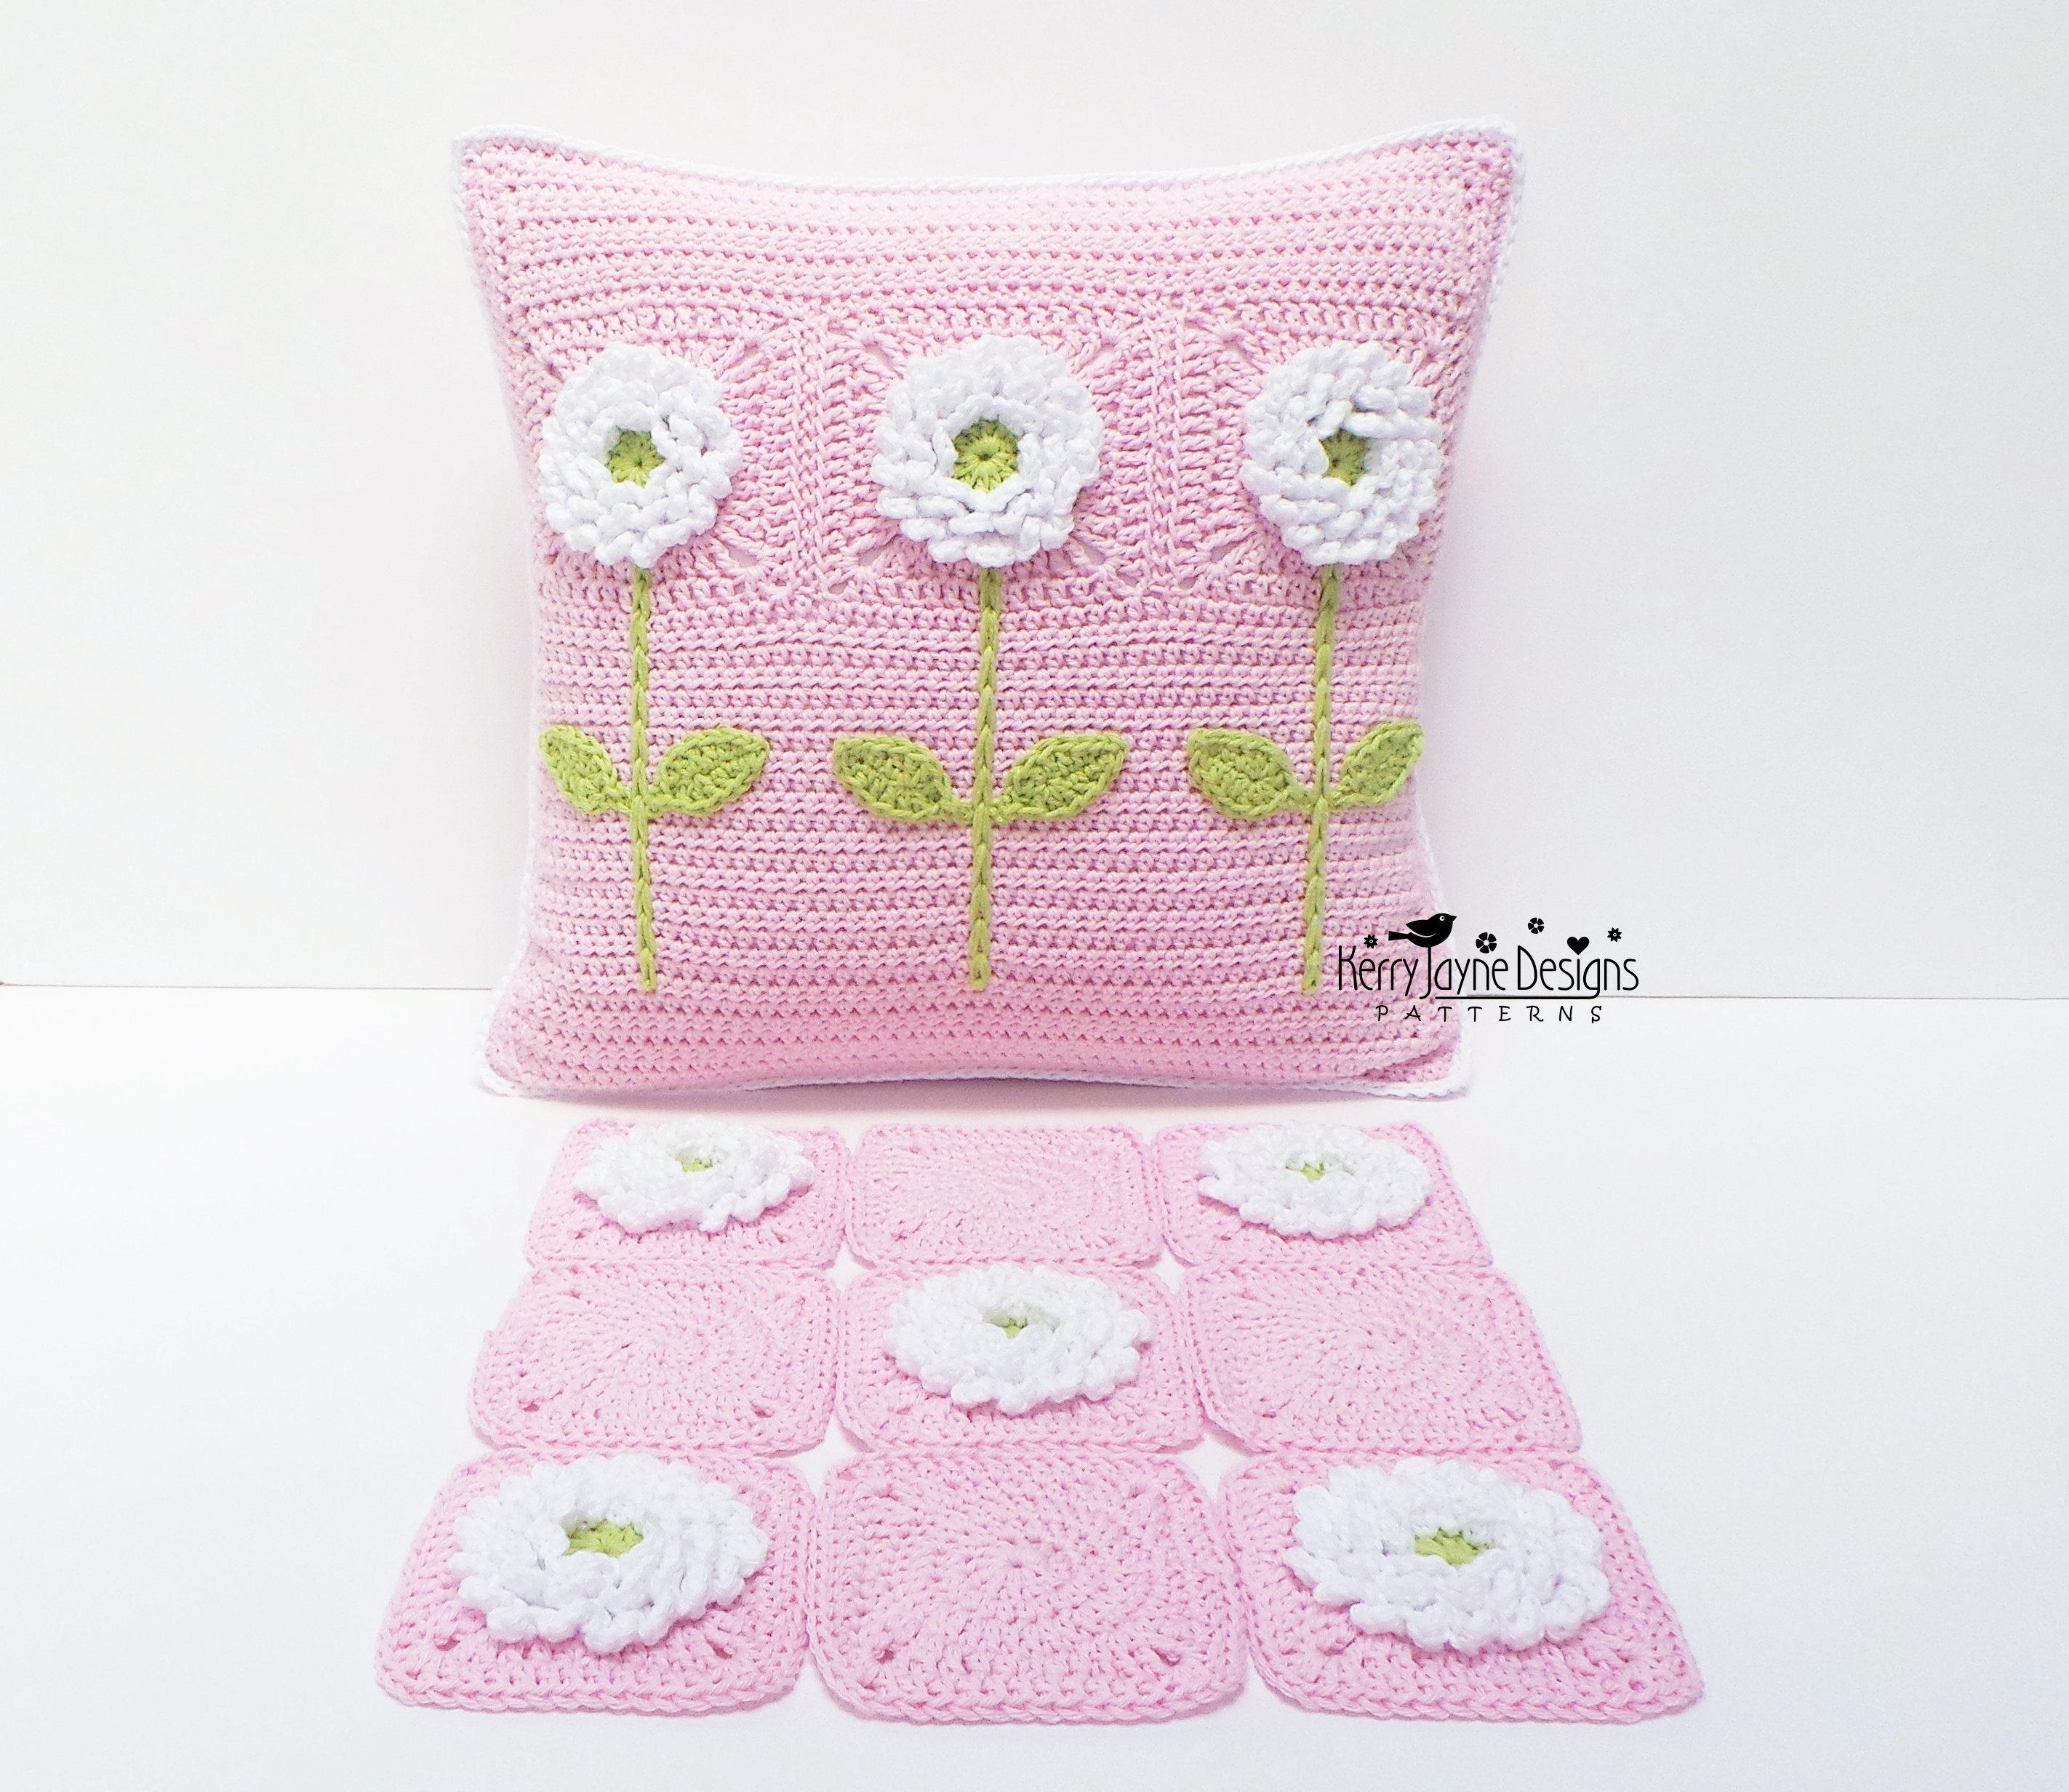 CROCHET CUSHION PATTERN Delightful Dahlia Pillow Crochet   Etsy